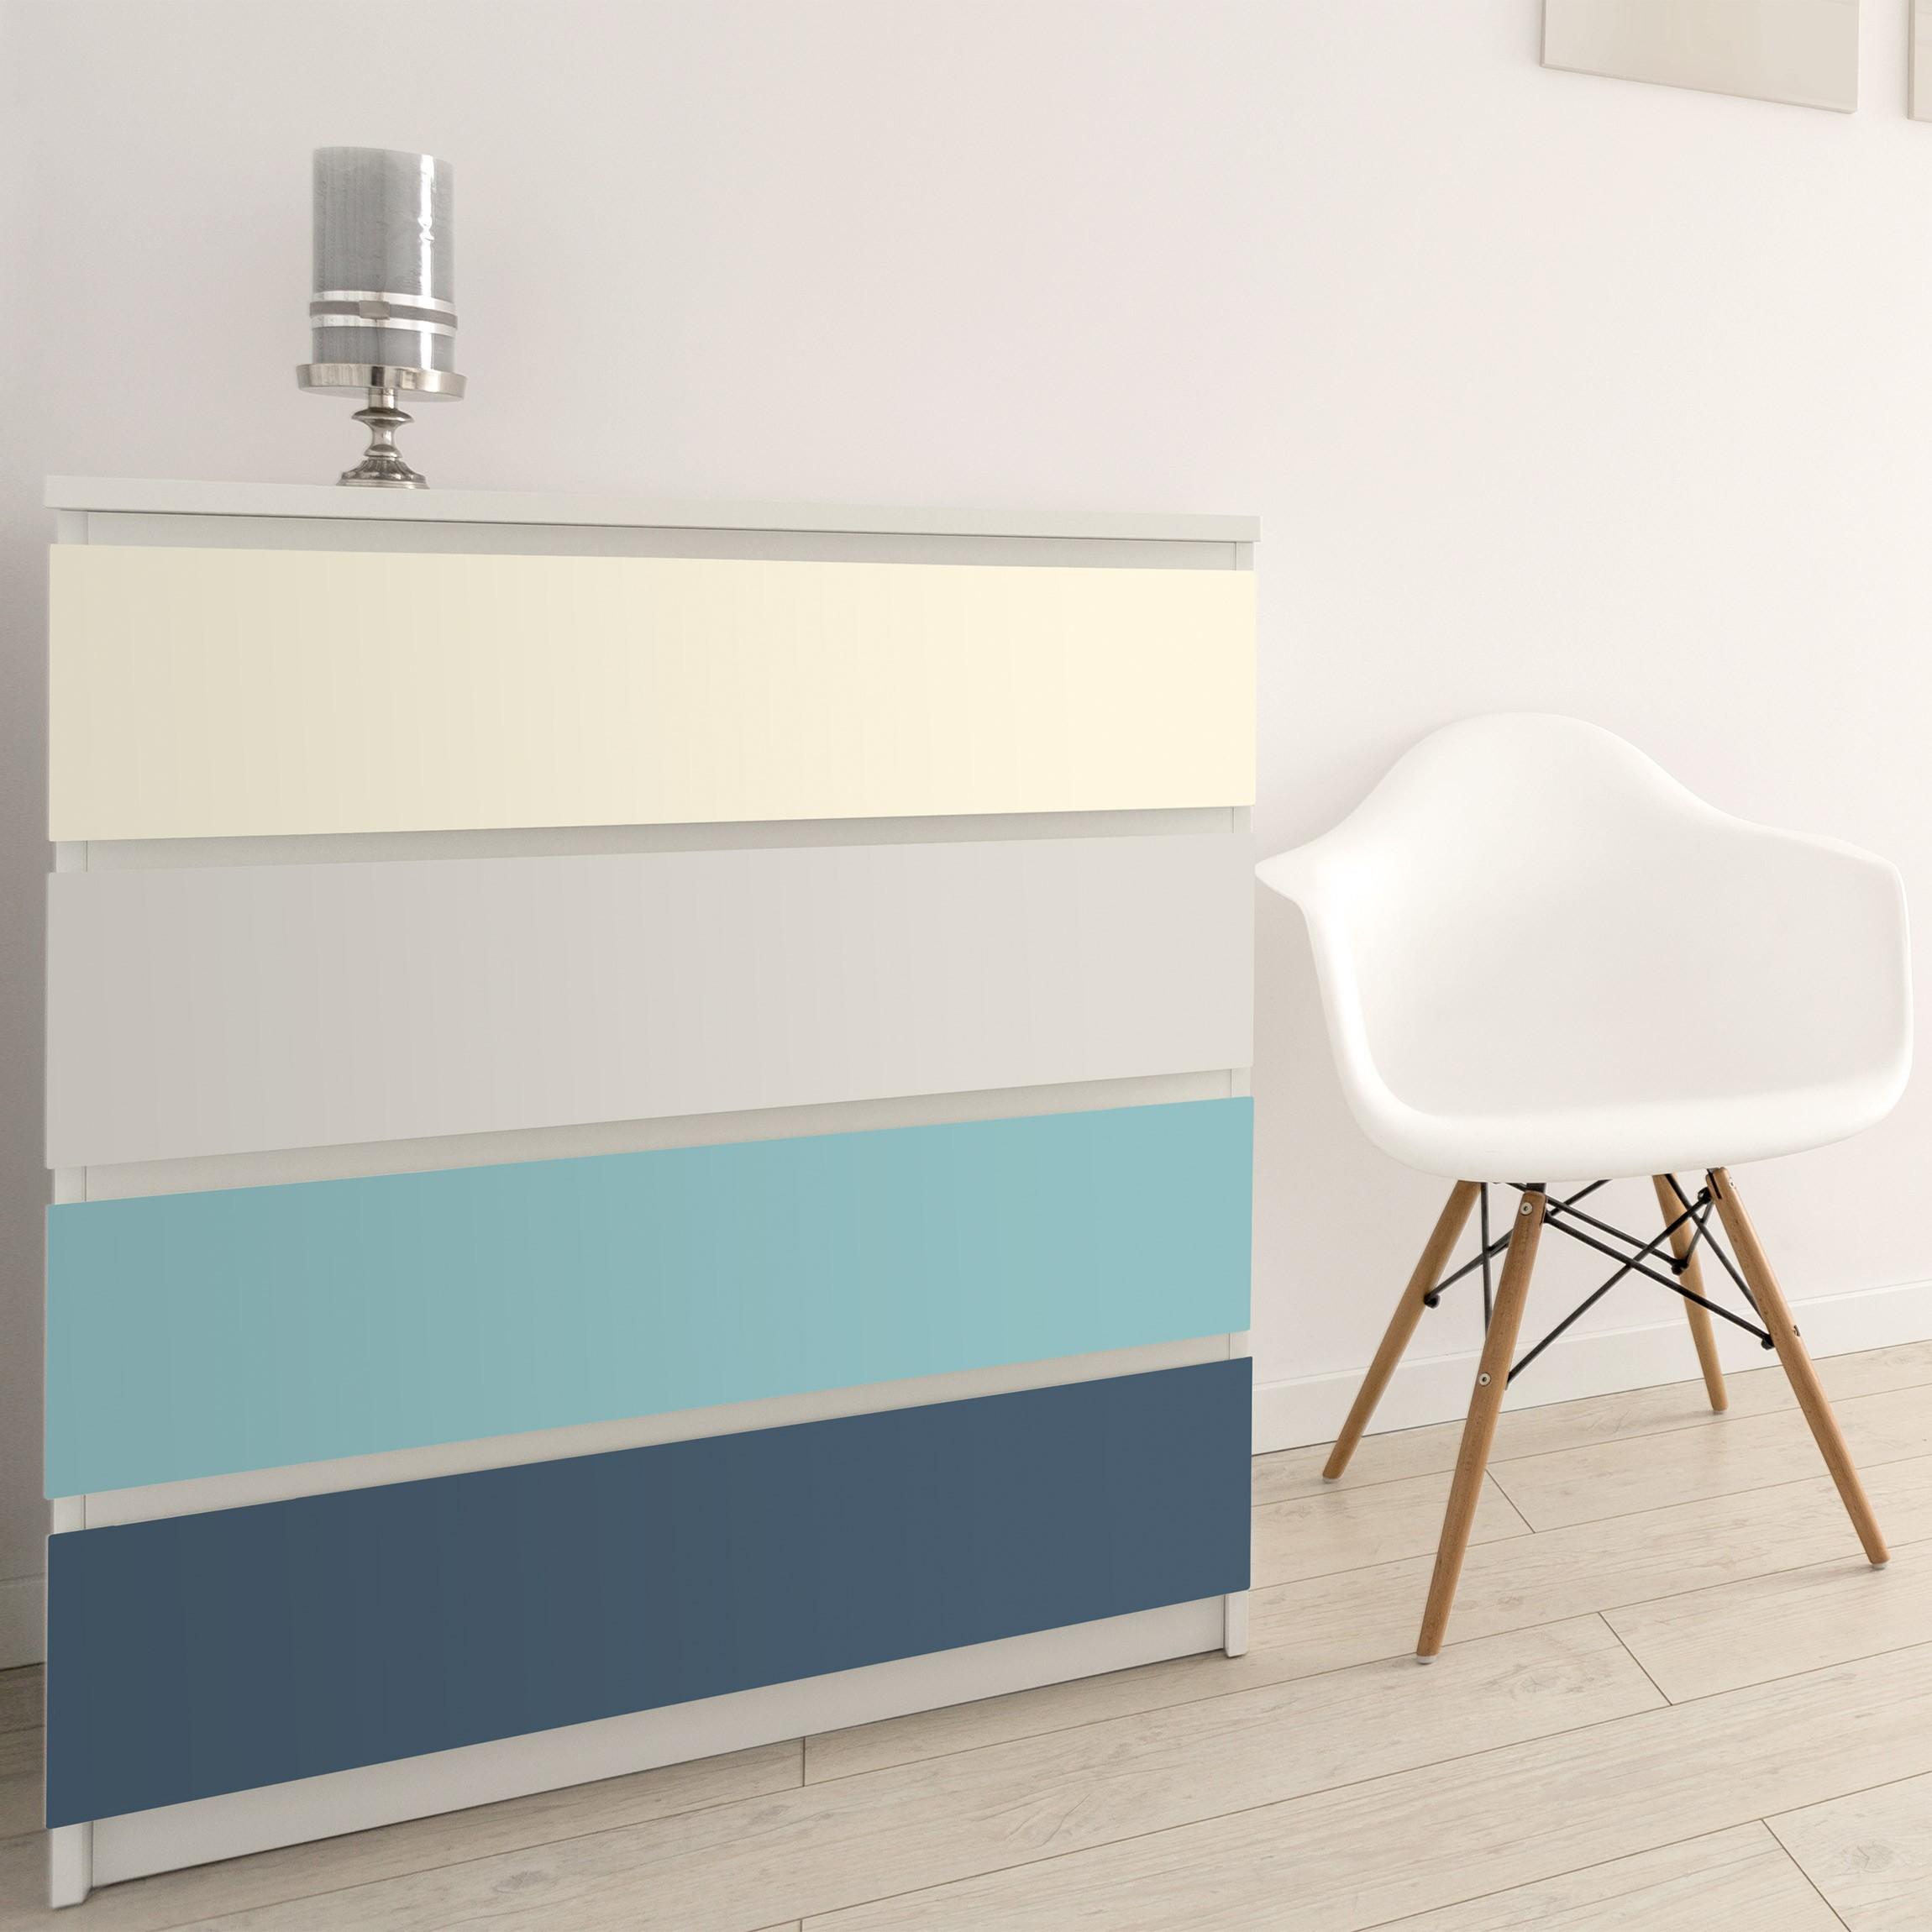 carta adesiva per mobili cashmere sandy pastel turquoise slate blue. Black Bedroom Furniture Sets. Home Design Ideas